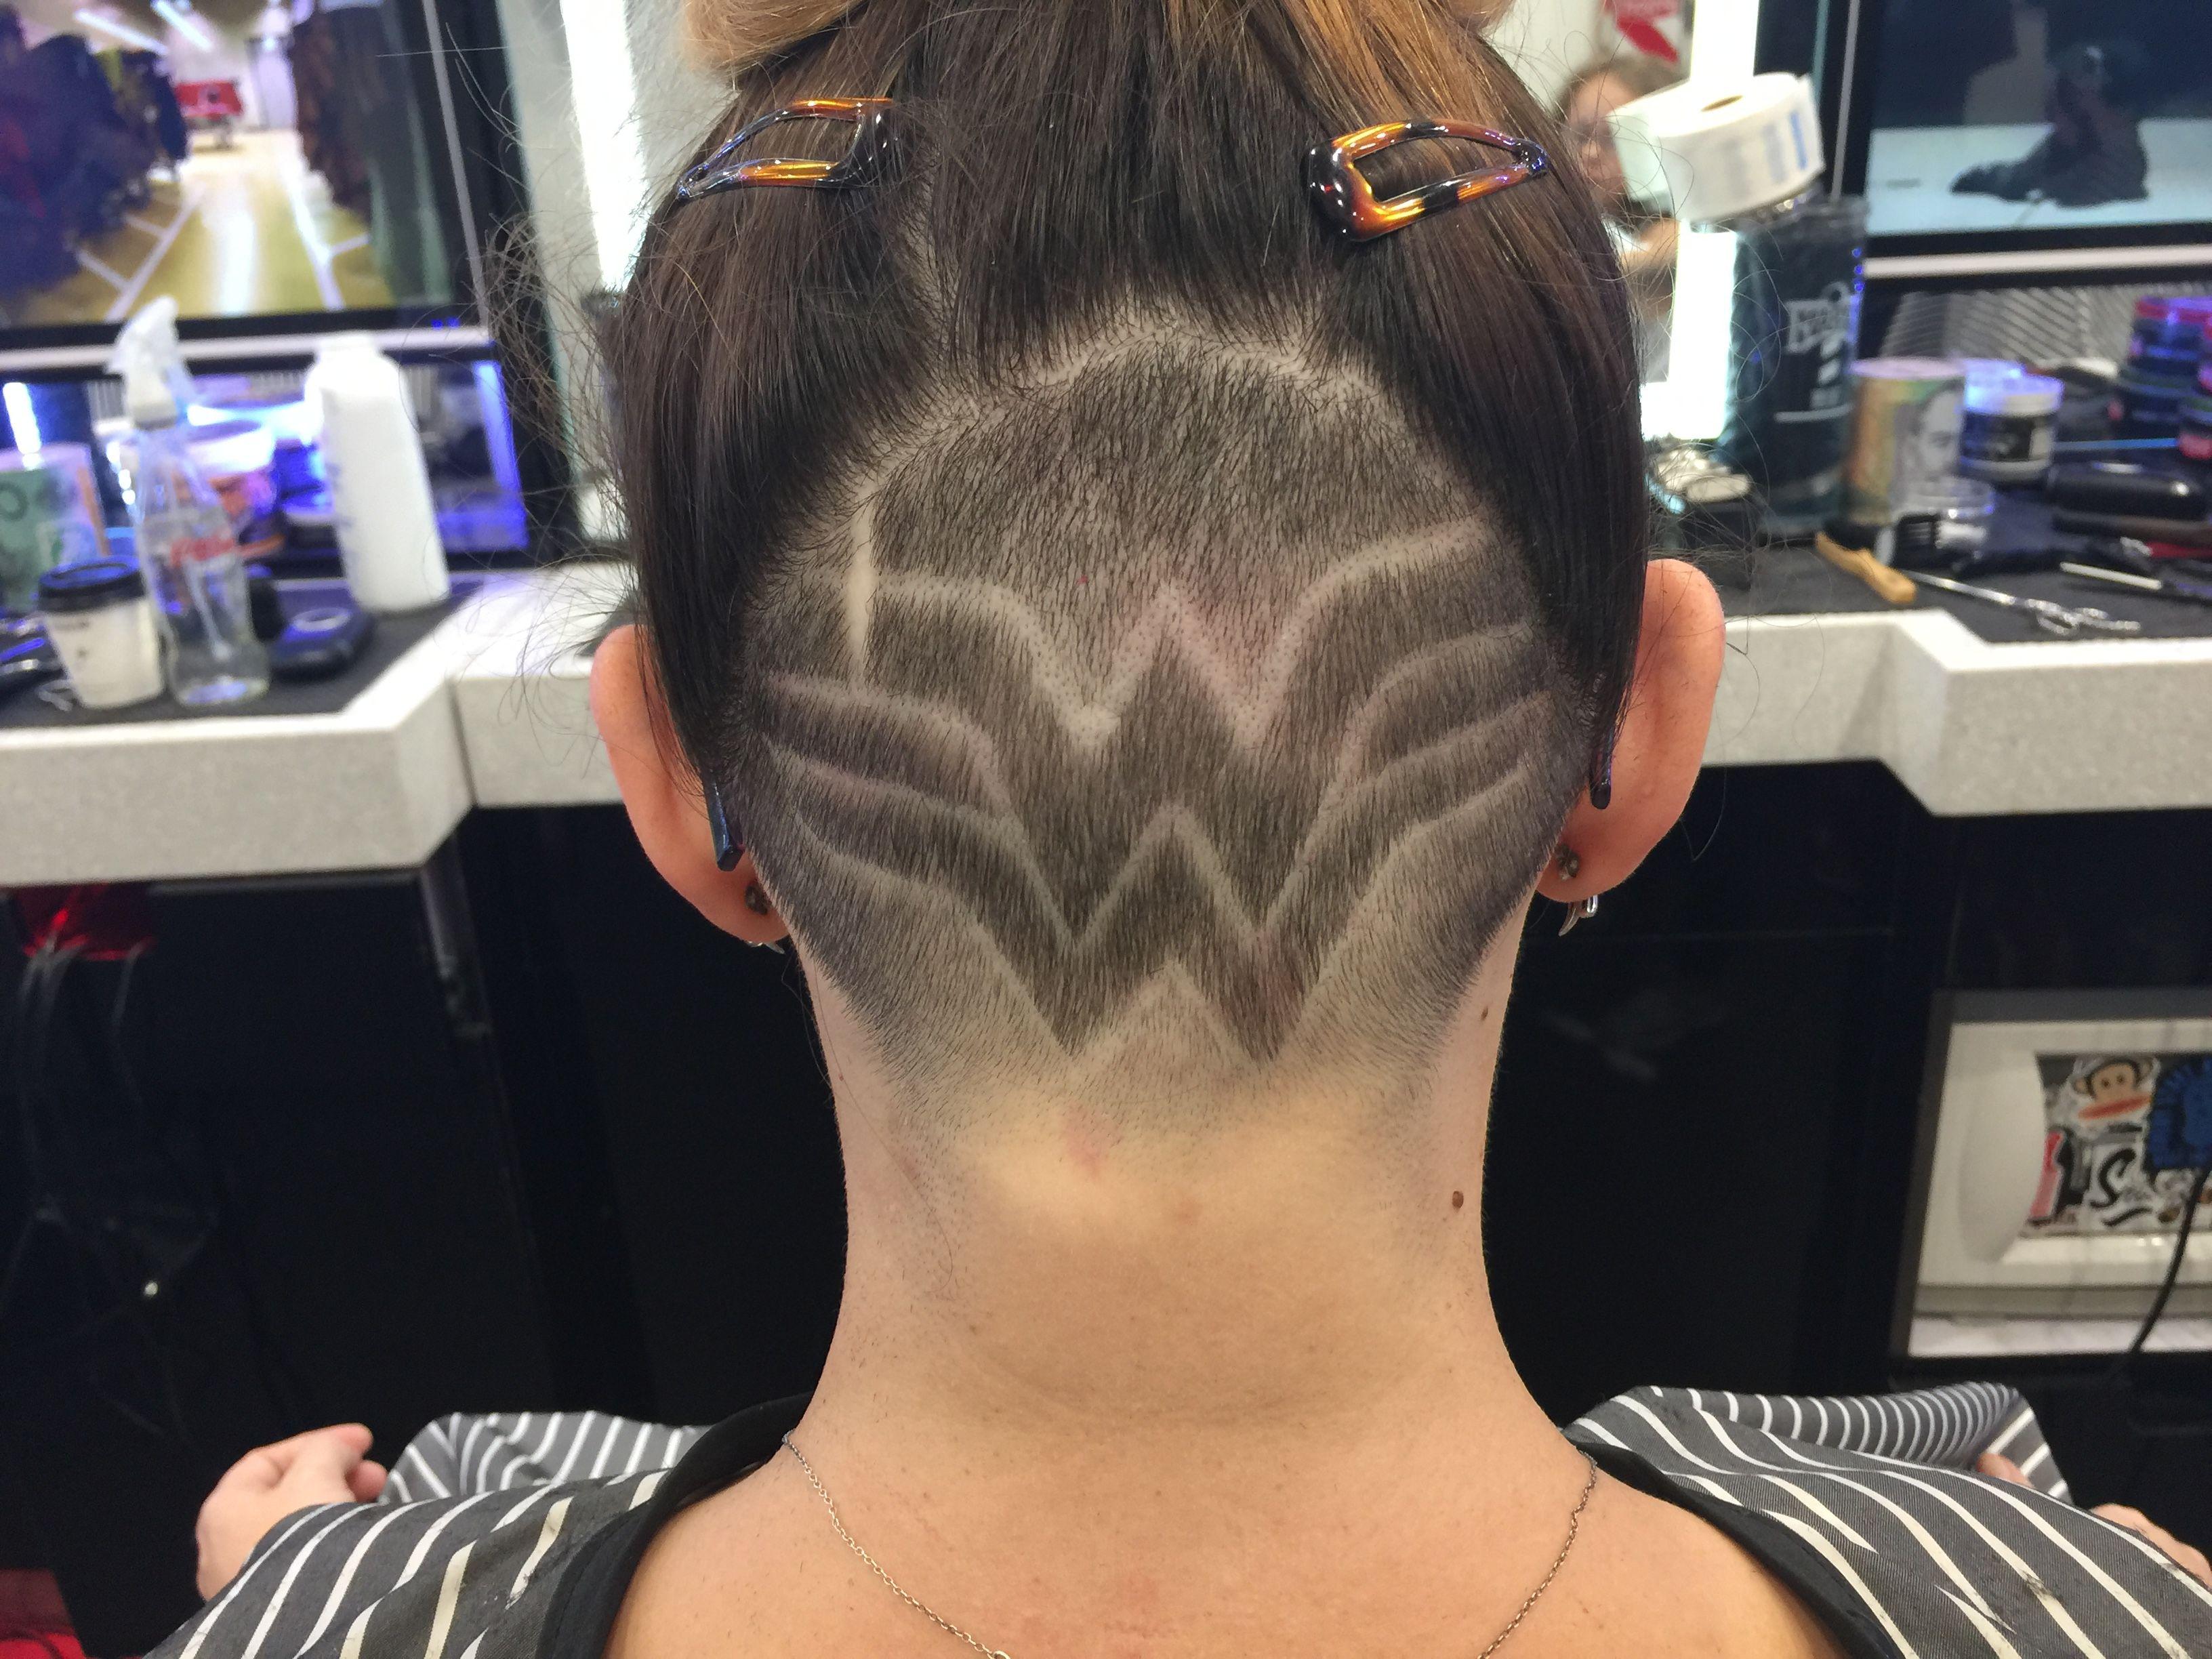 shaved Wonder woman